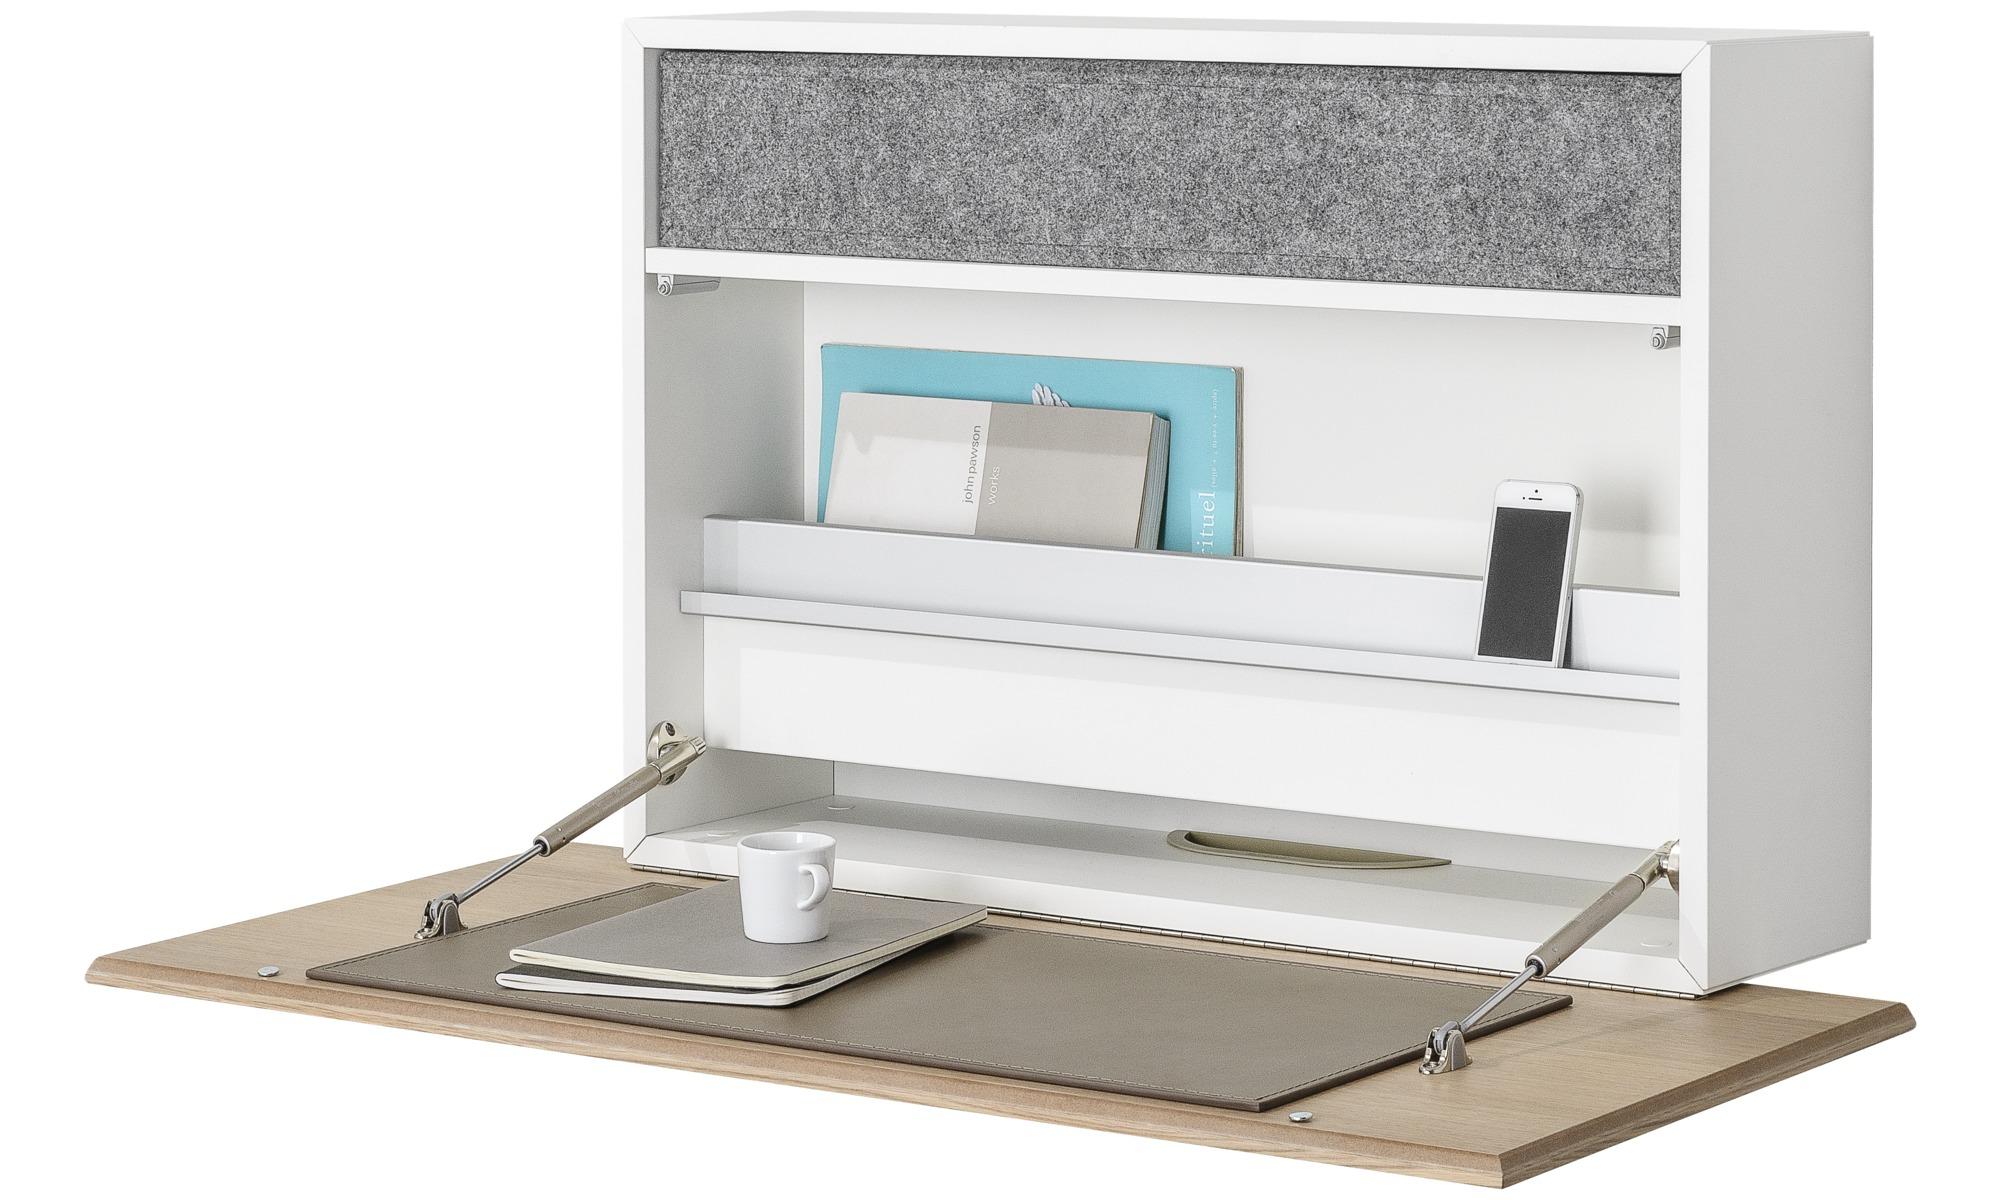 bureaus cupertino wandbureau boconcept. Black Bedroom Furniture Sets. Home Design Ideas